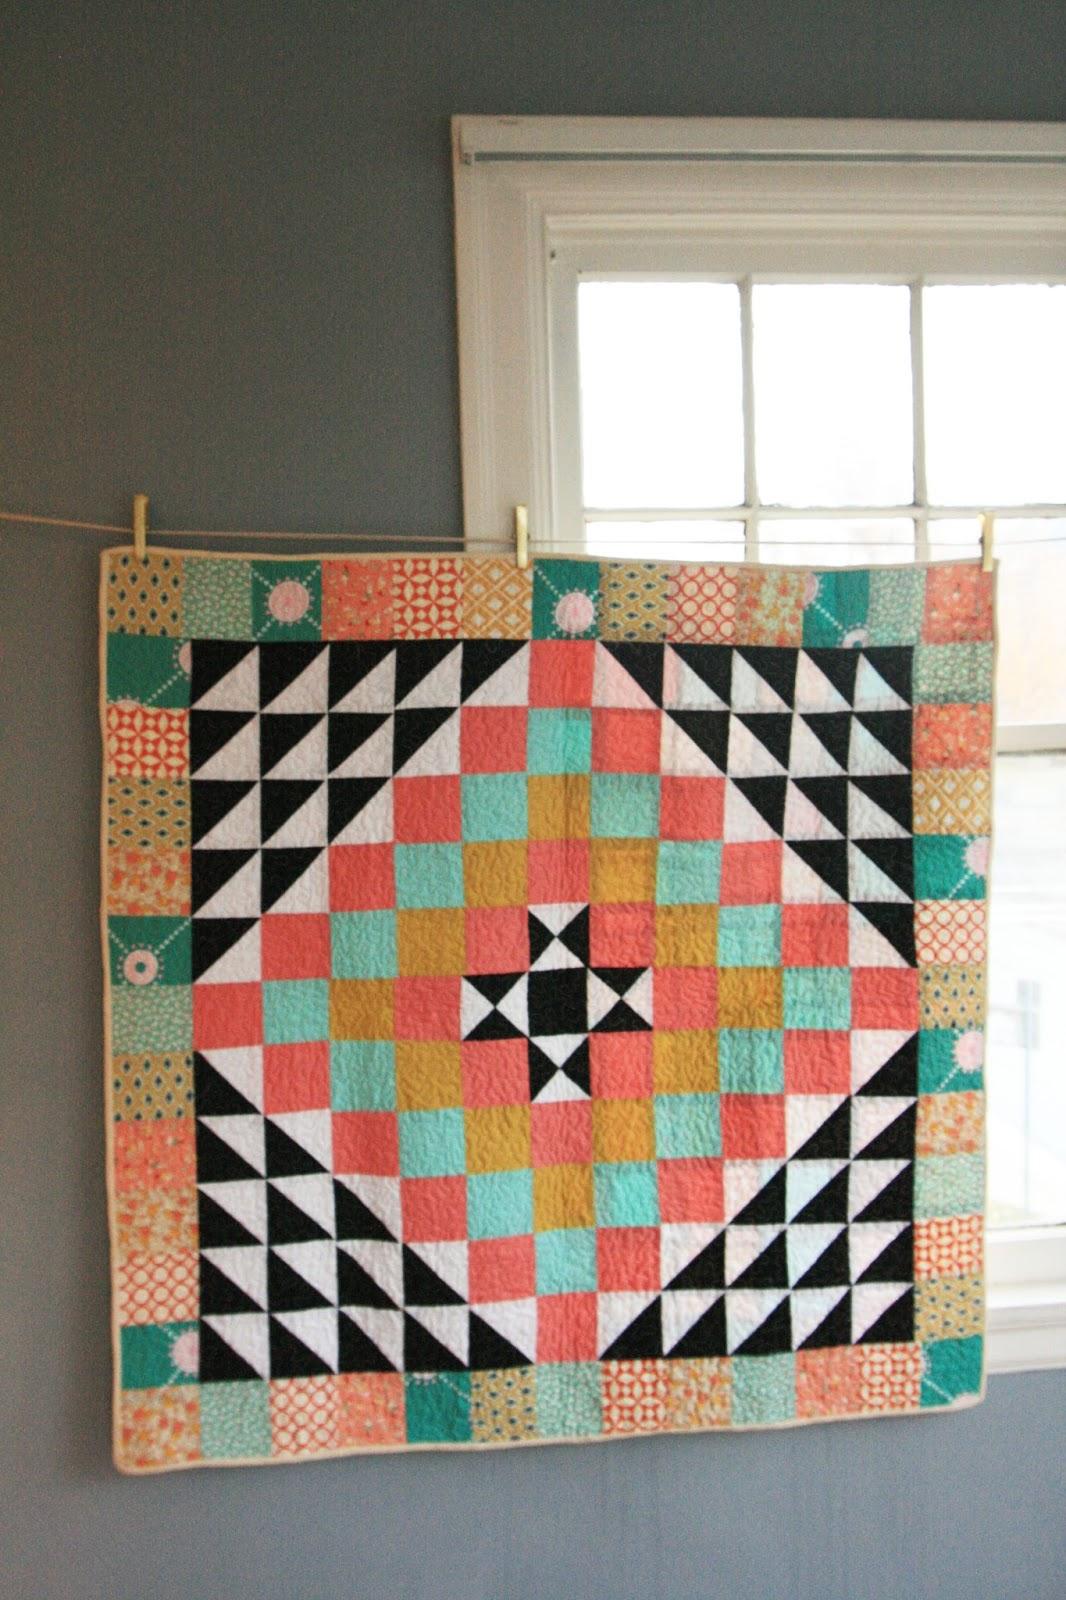 GIRLS PEARLS POWDER: Geometric Baby Quilt Pattern